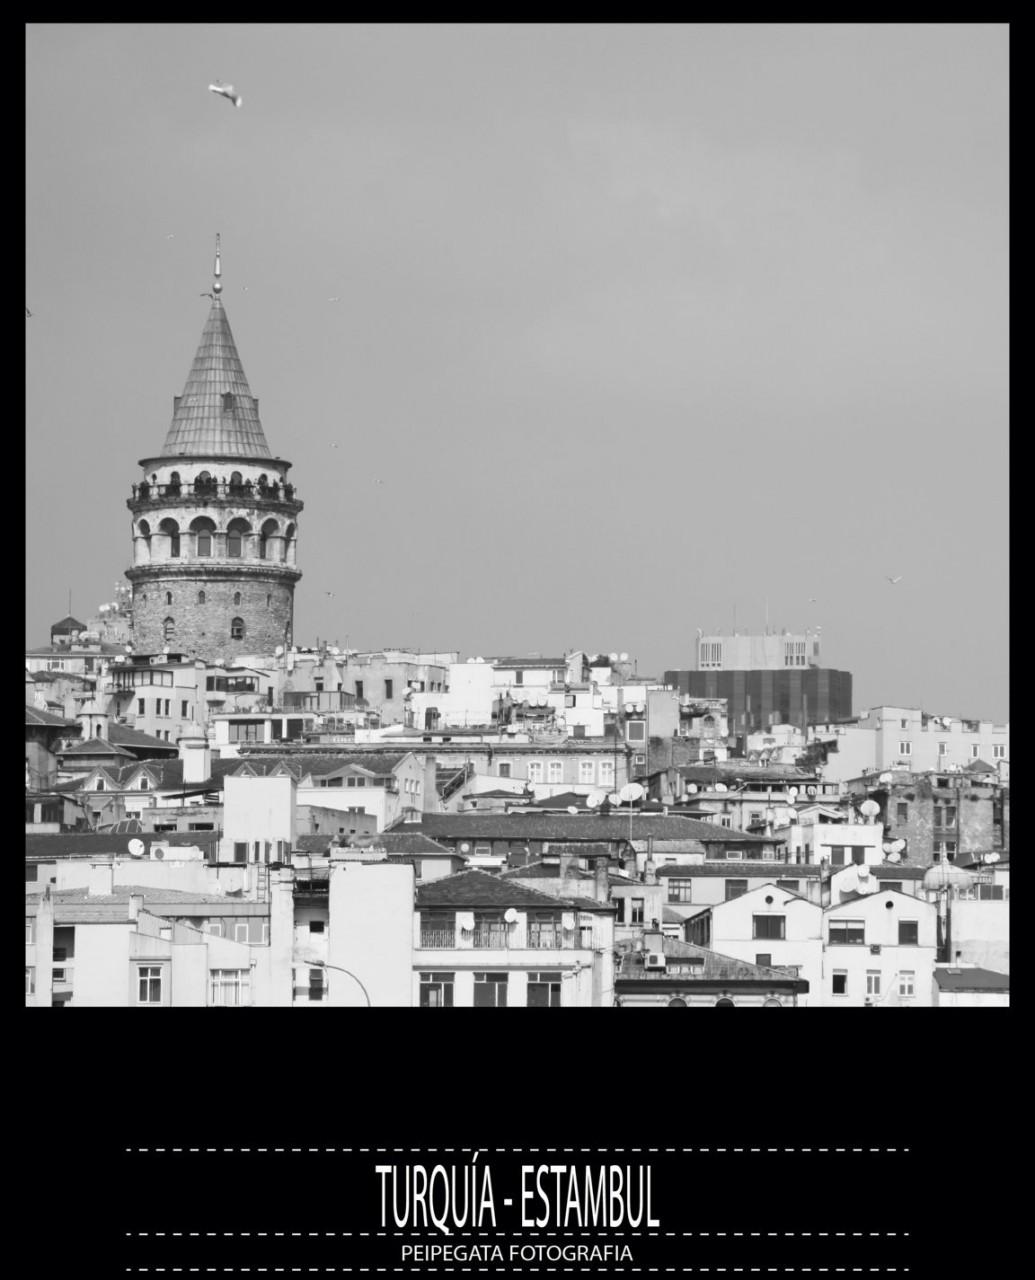 peipegata turquia estambul istanbul viajes fotografia peipegatafotografia